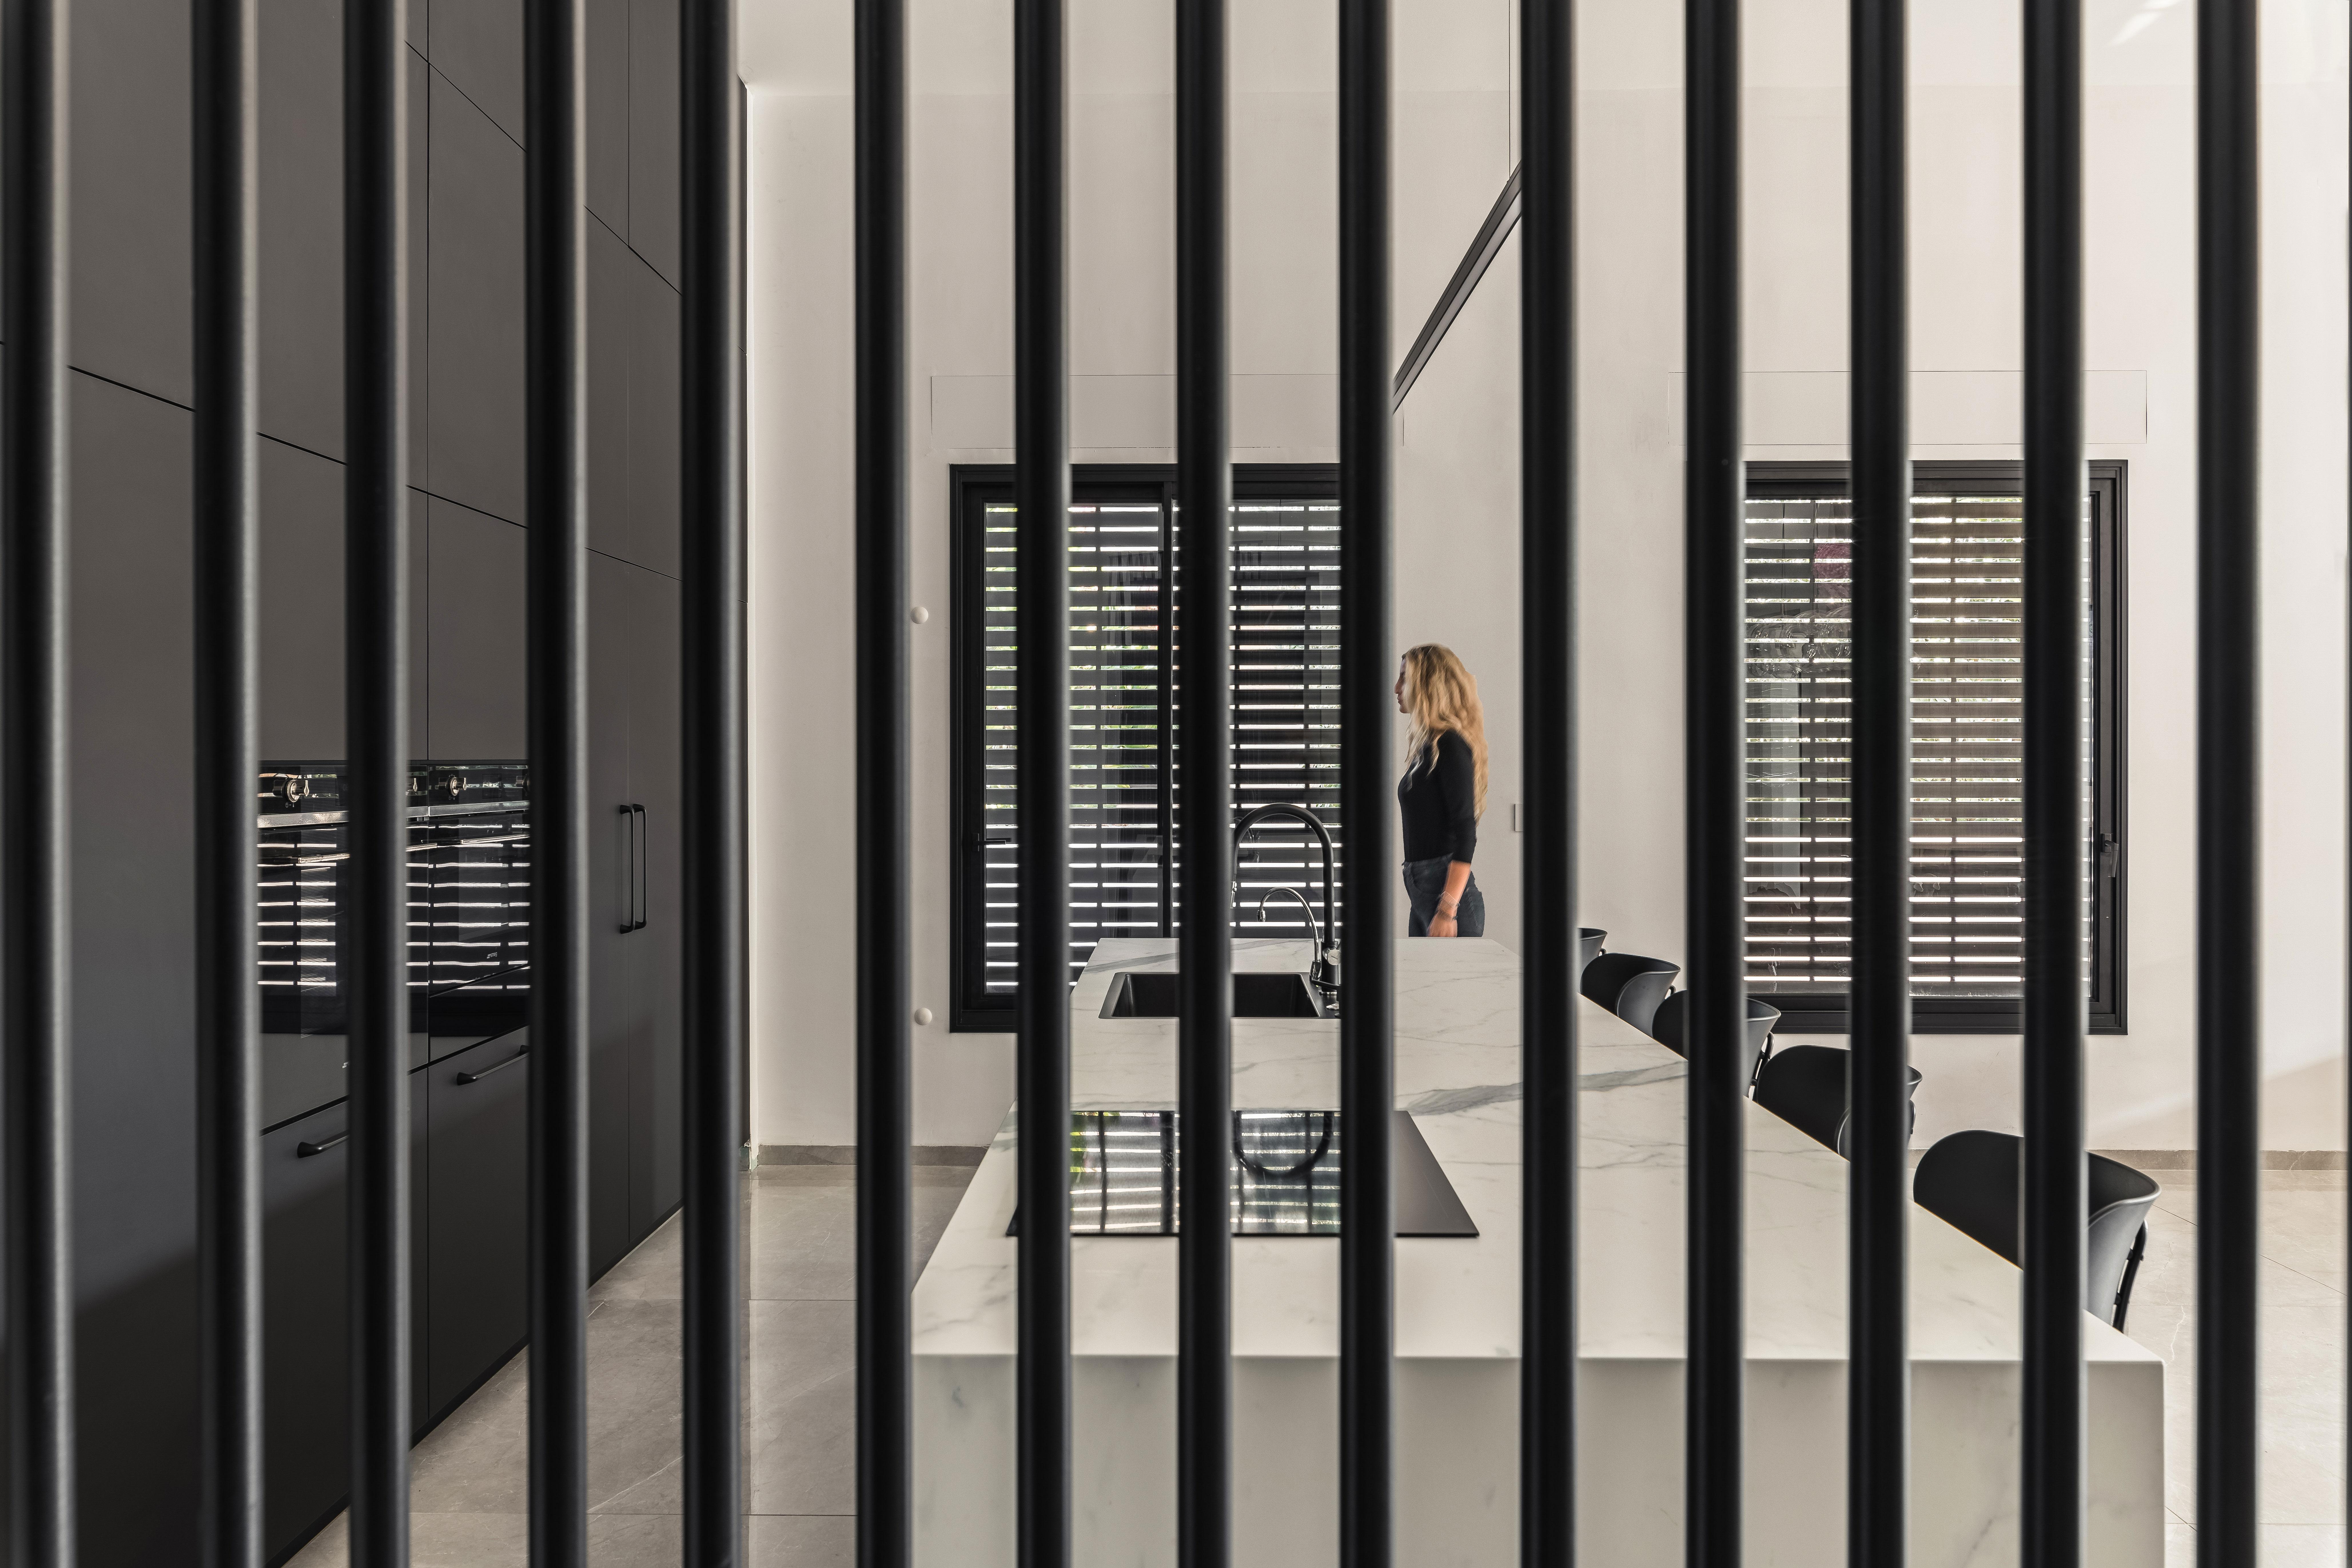 Architecture Photography by Einat Dekel